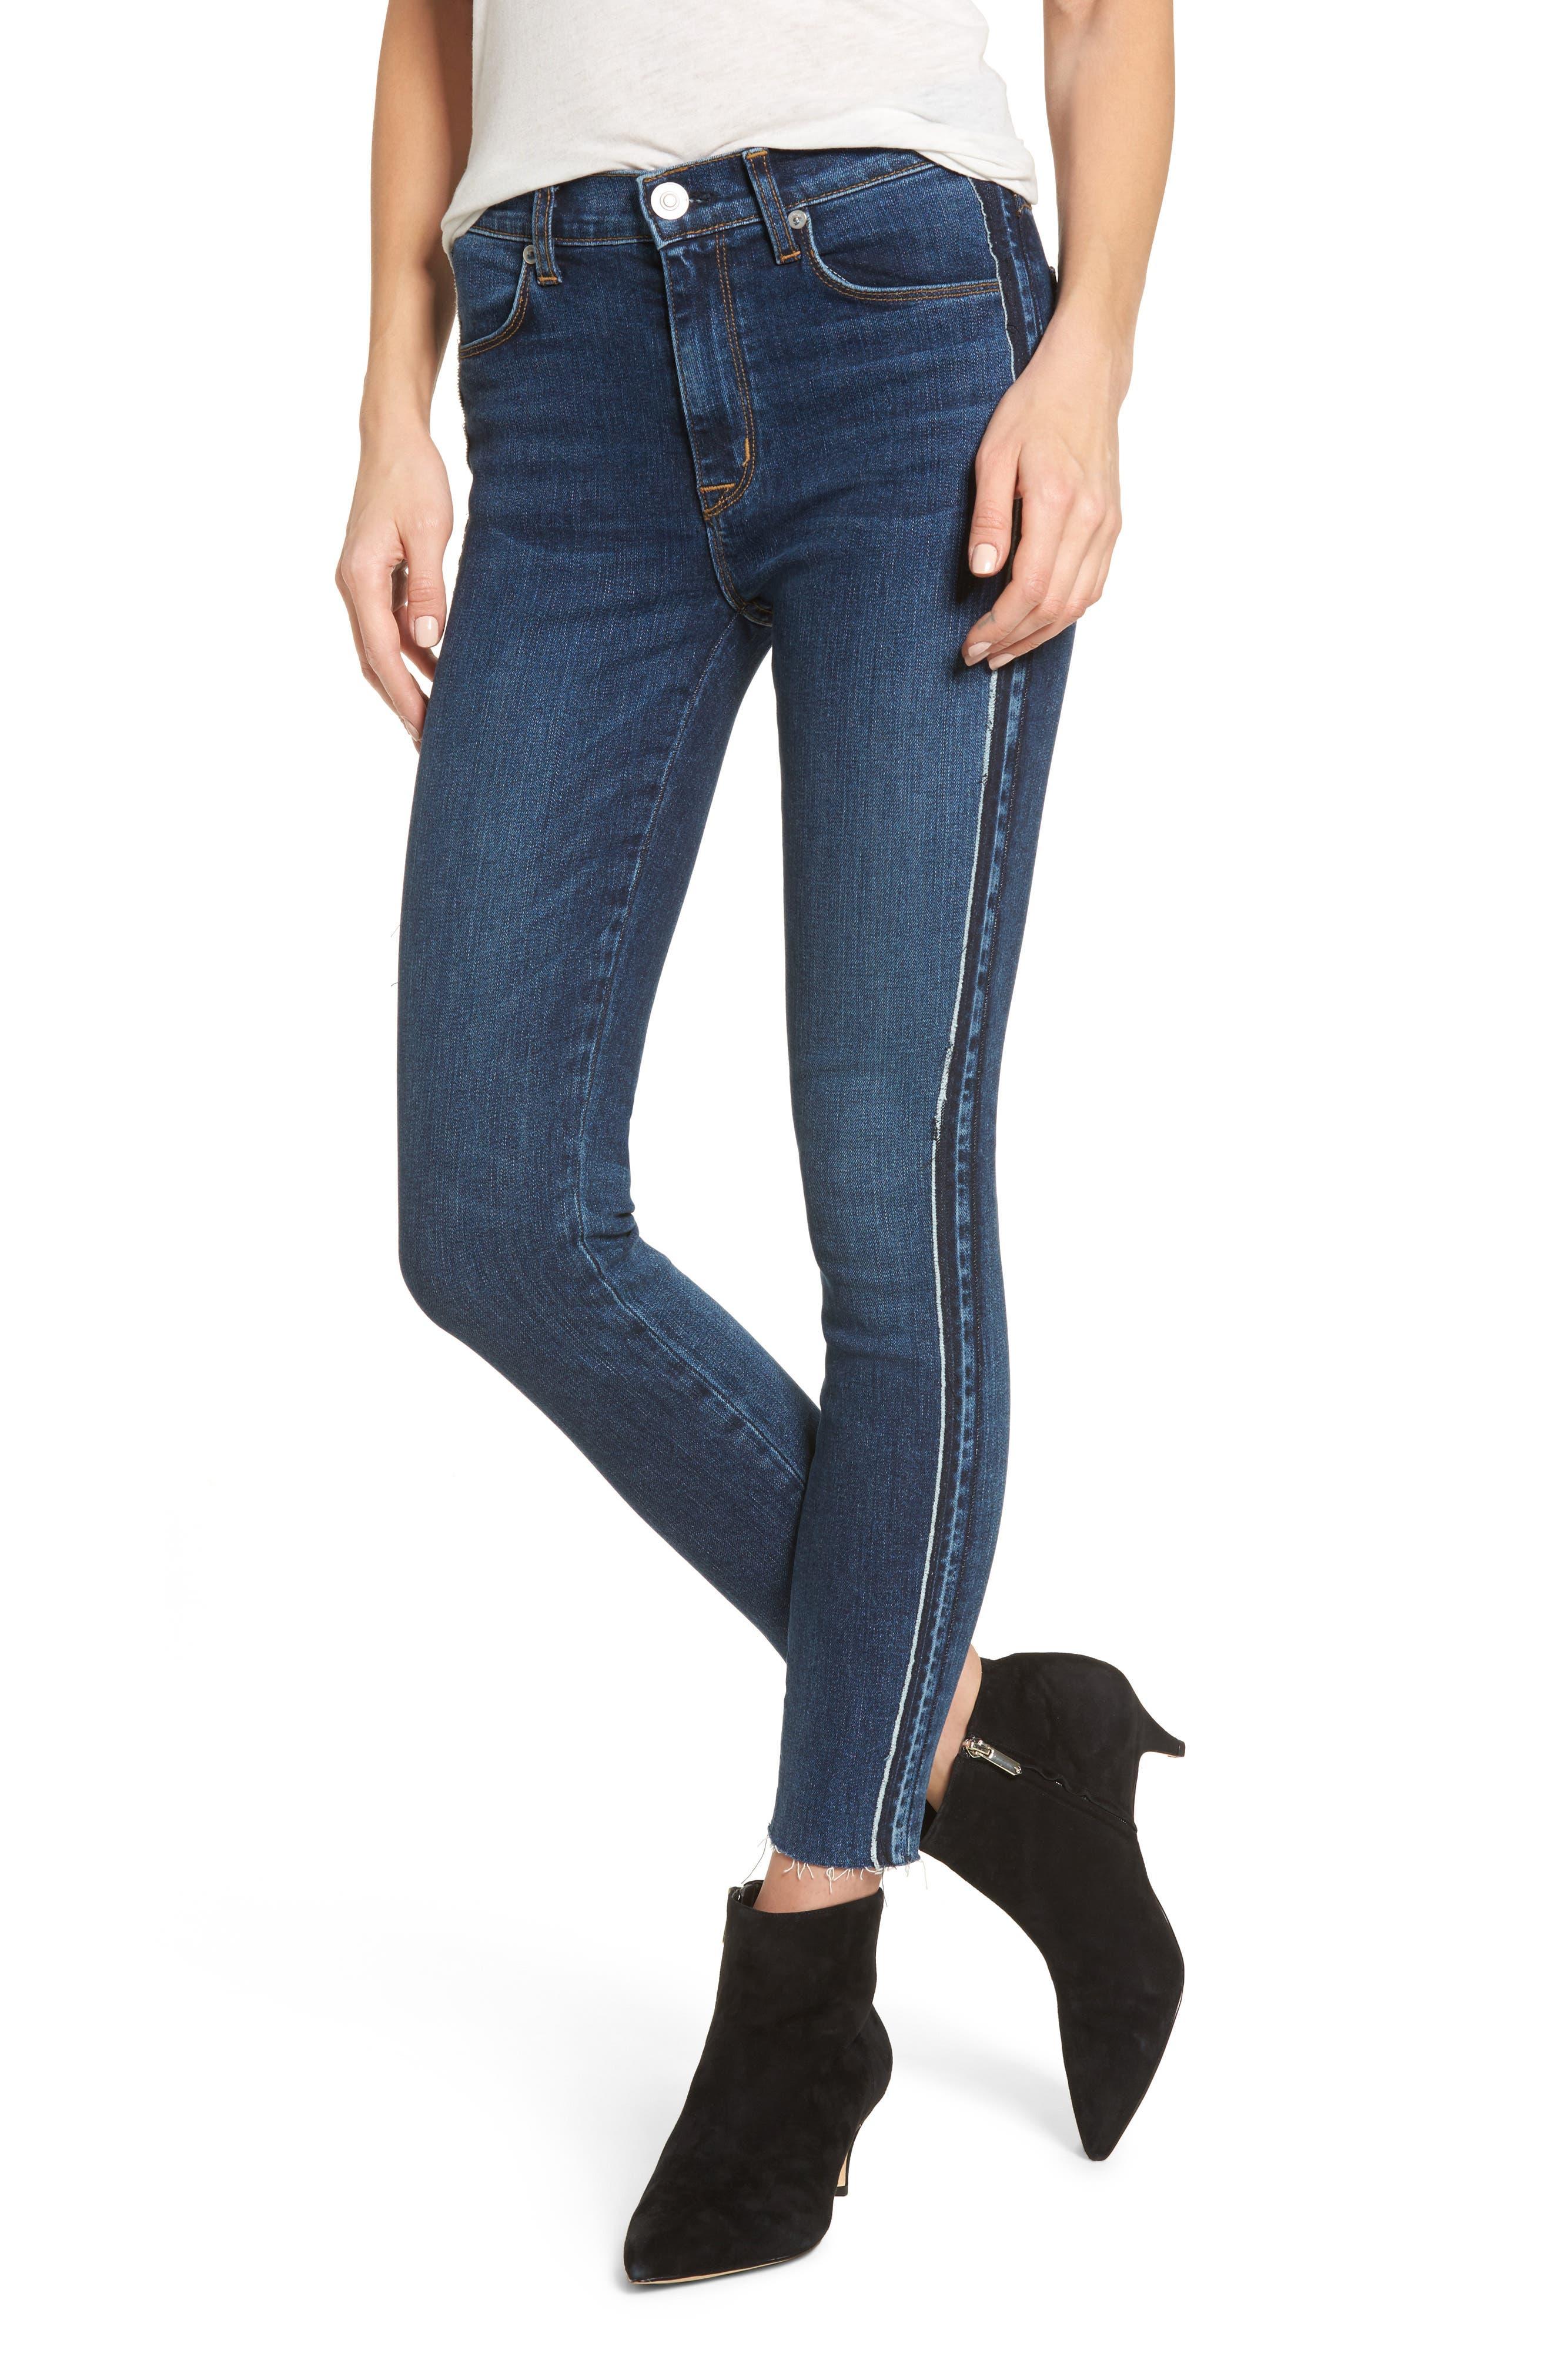 Barbara High Waist Super Skinny Jeans,                         Main,                         color, 400